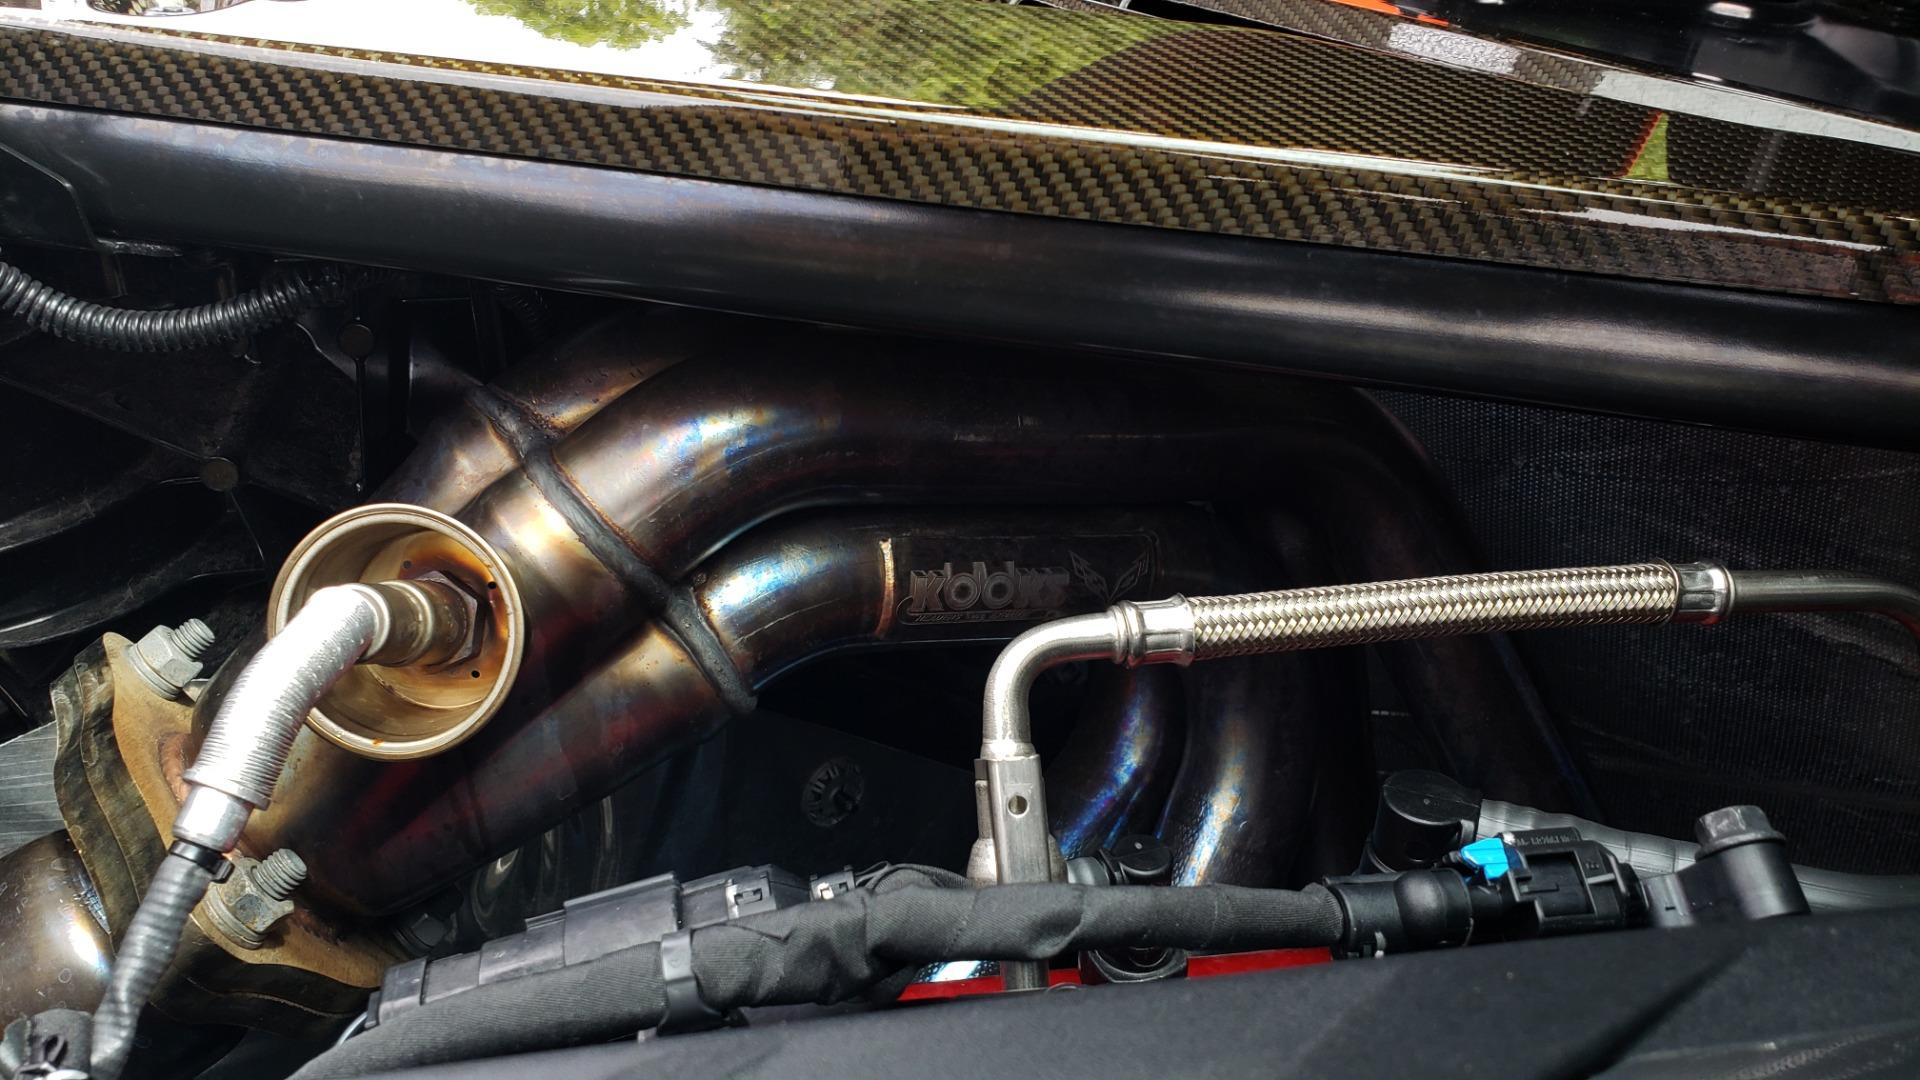 Used 2020 Chevrolet CORVETTE C8 STINGRAY 2LT / 6.2L V8 / 8-SPD AUTO / NAV / BOSE / REARVIEW / DATA RECOR for sale Sold at Formula Imports in Charlotte NC 28227 26